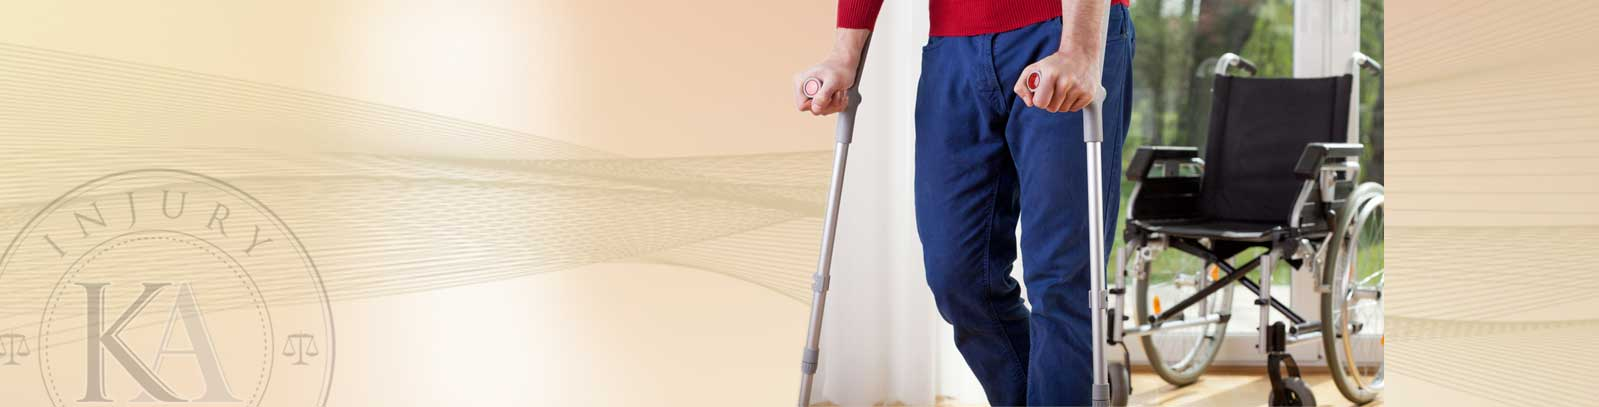 Long/Short-Term Disability Benefits